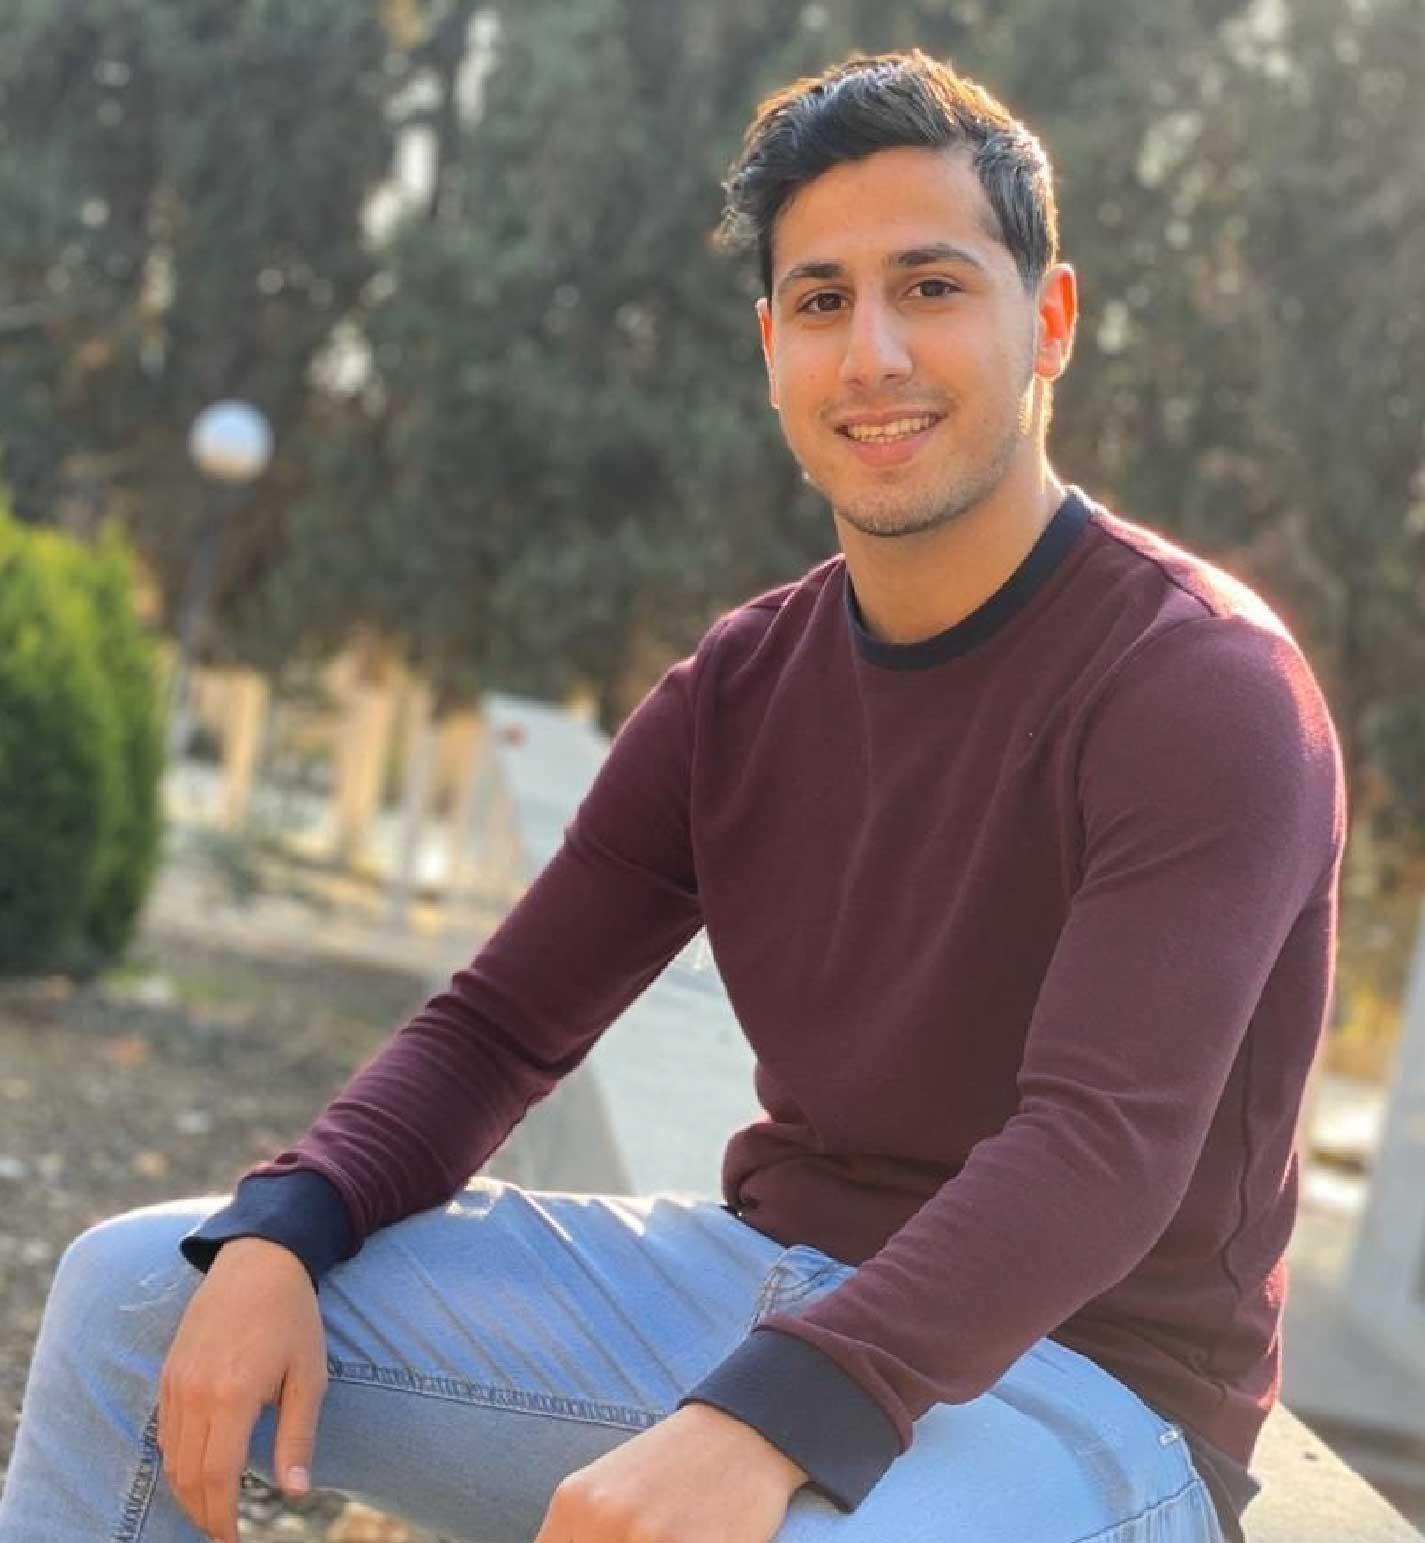 Adel Jaradat